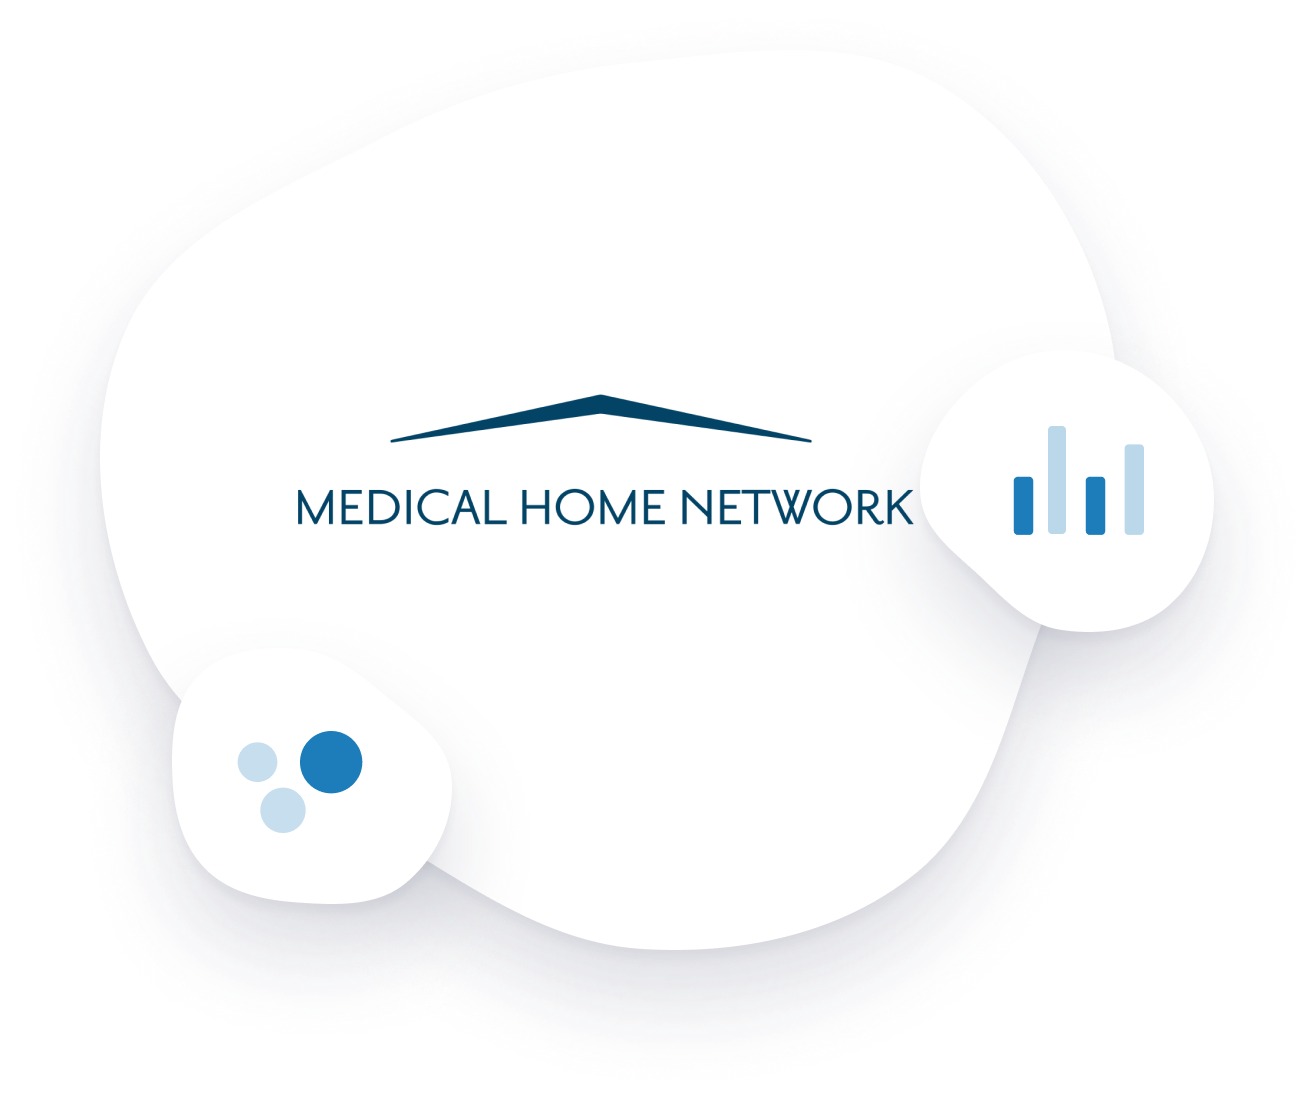 medical home network